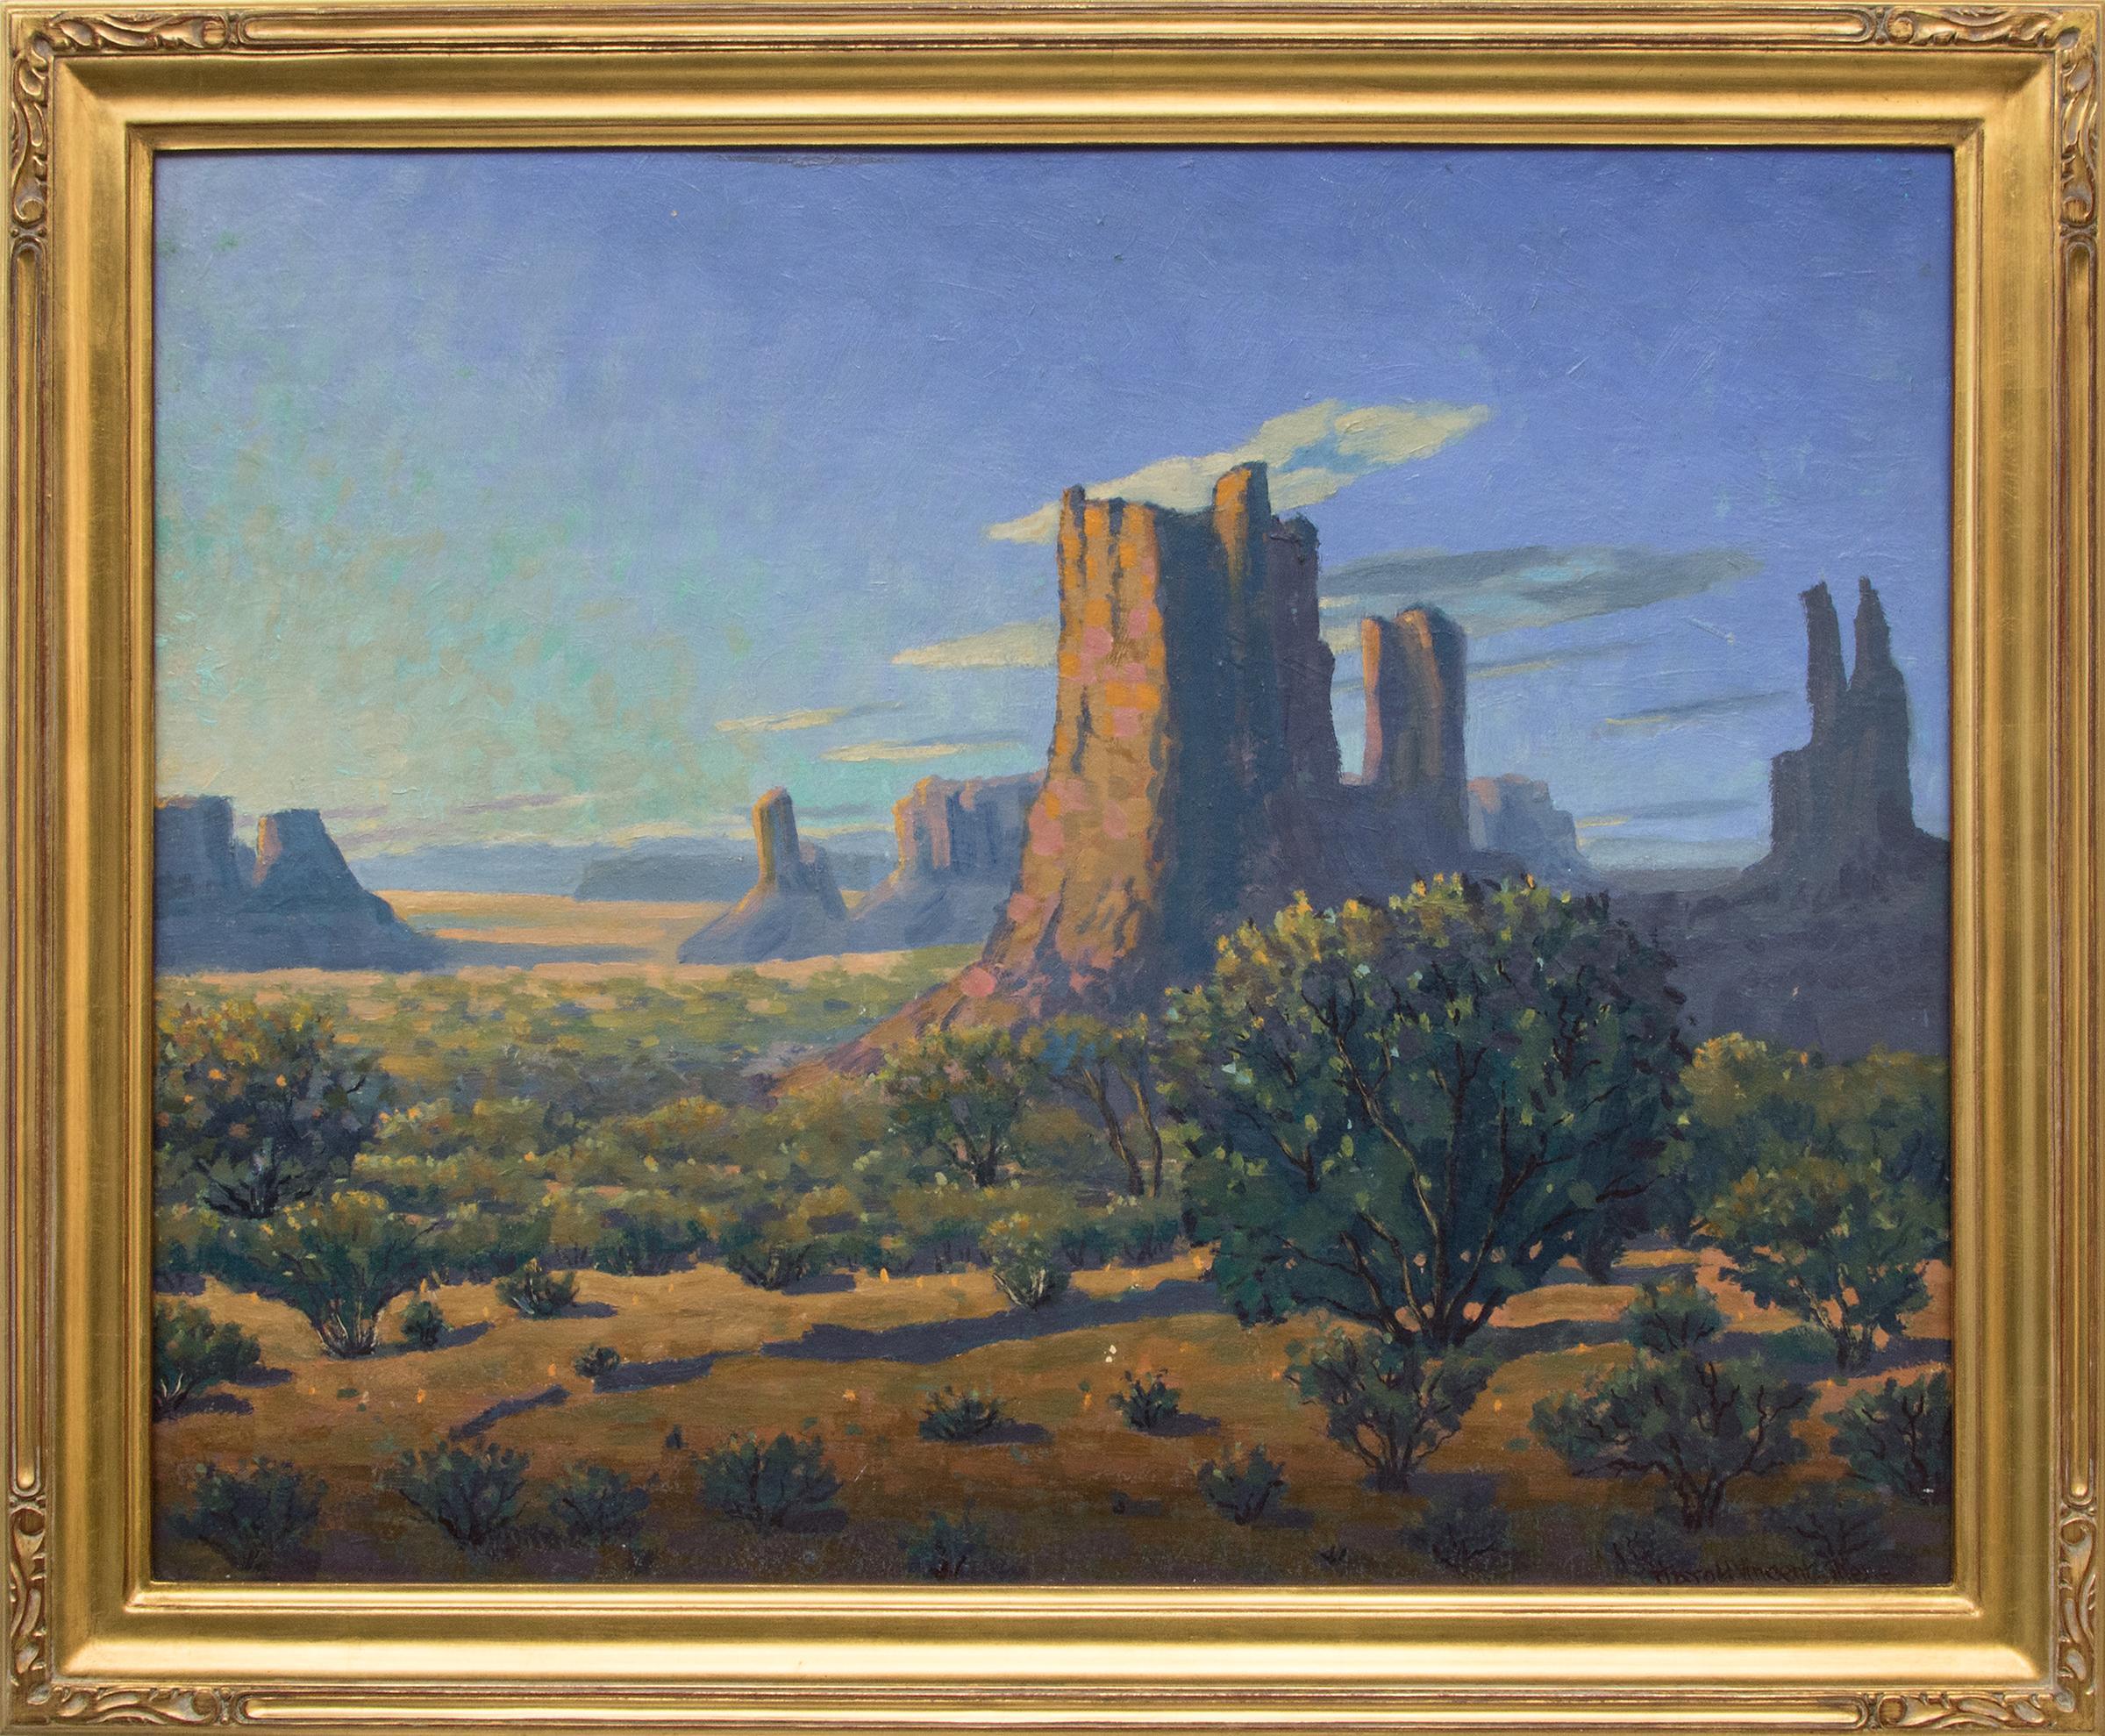 Monuments: Sunrise (Traditional Desert Landscape Painting, Vintage 1950s)